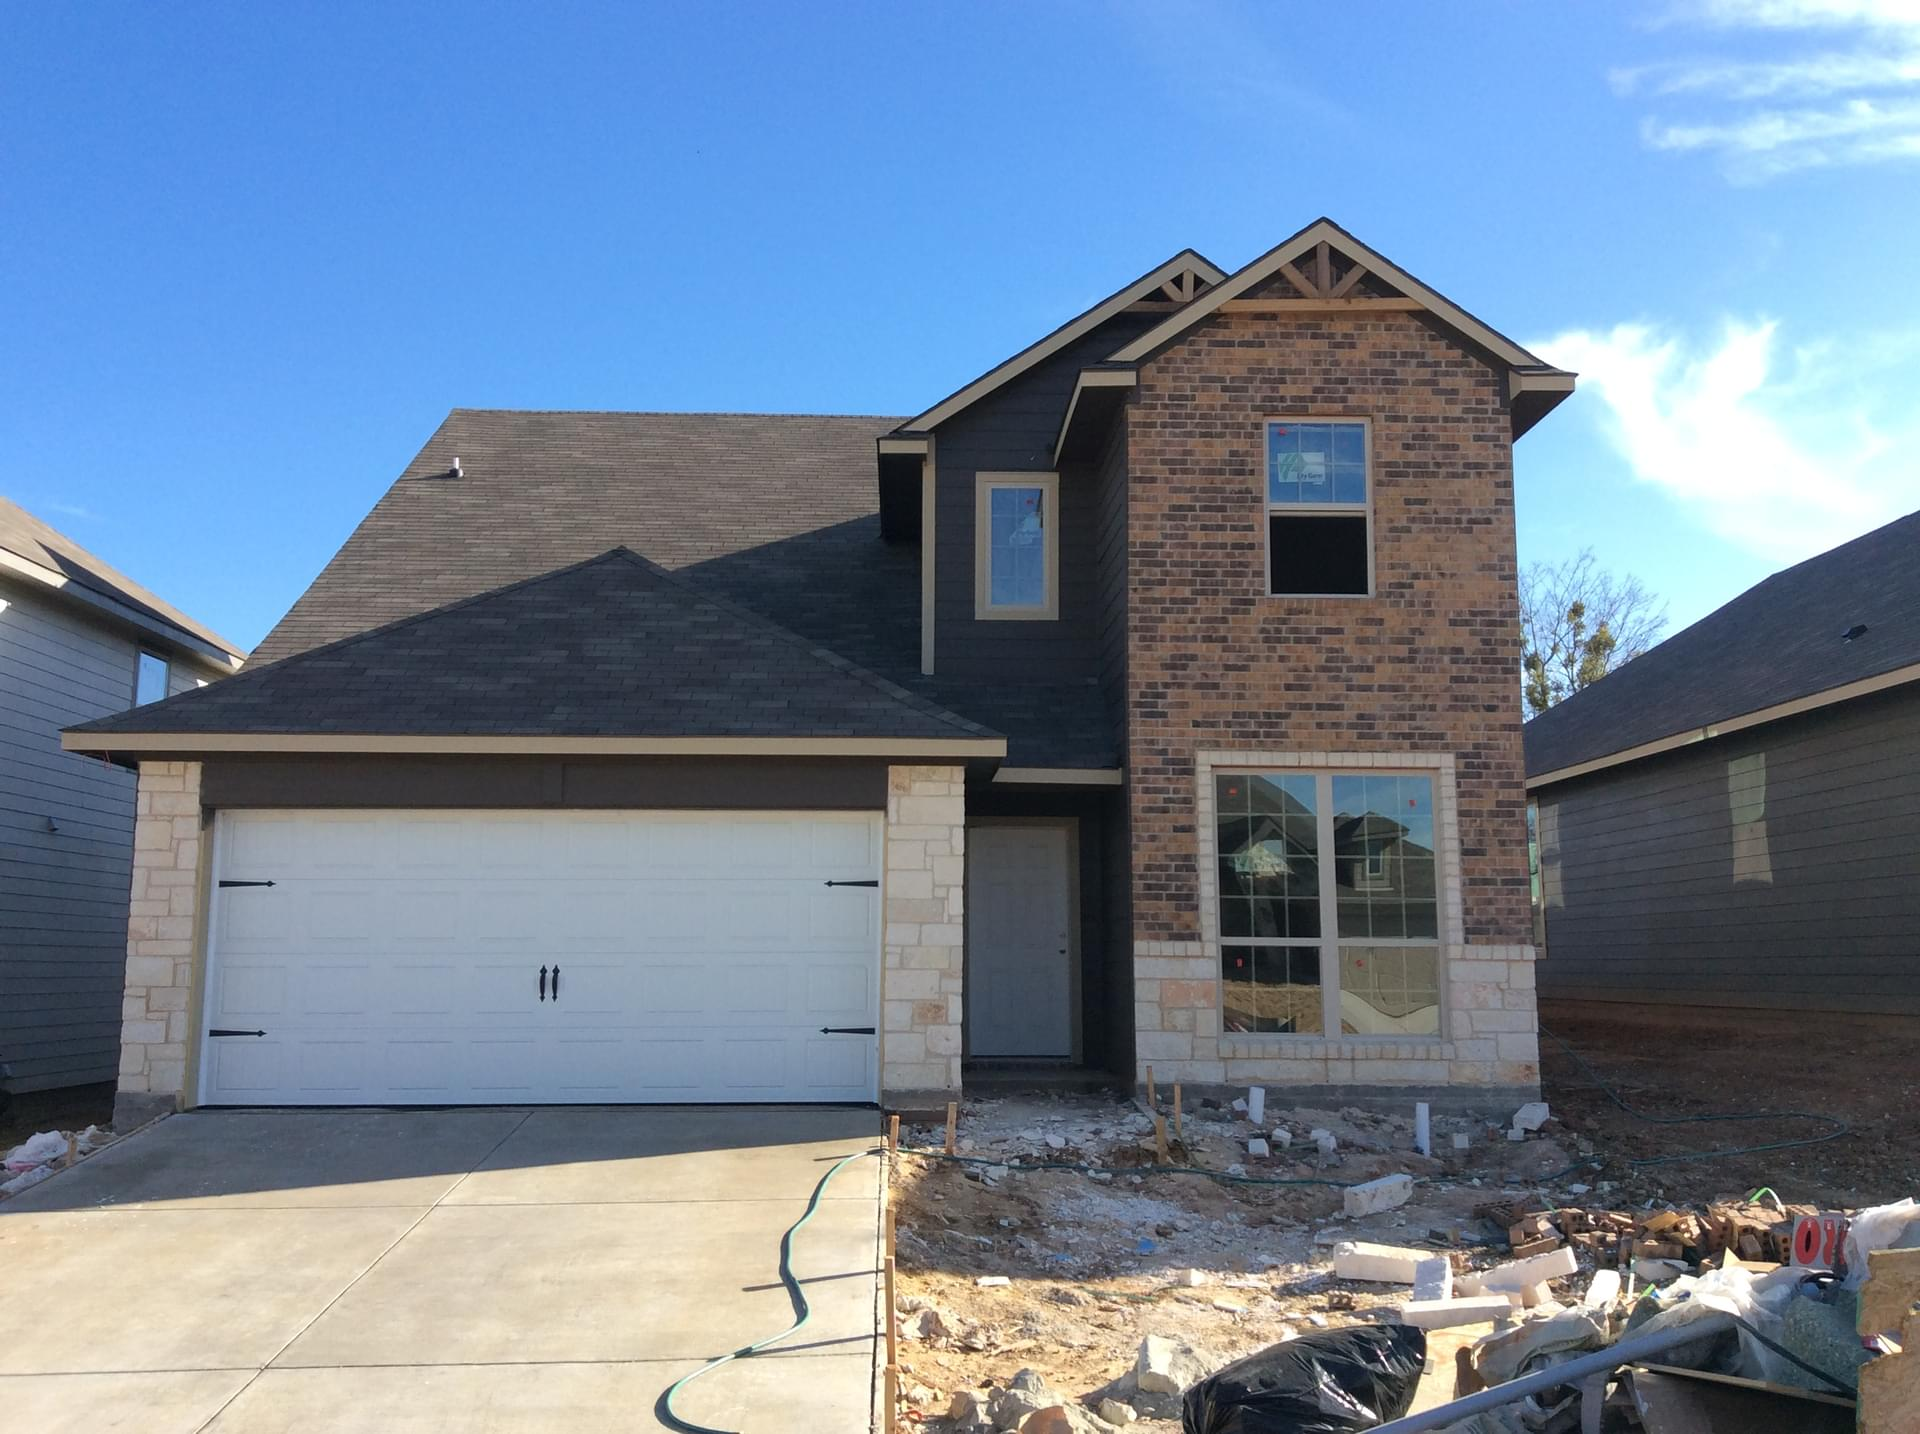 10213 Driskill Drive in Waco, TX